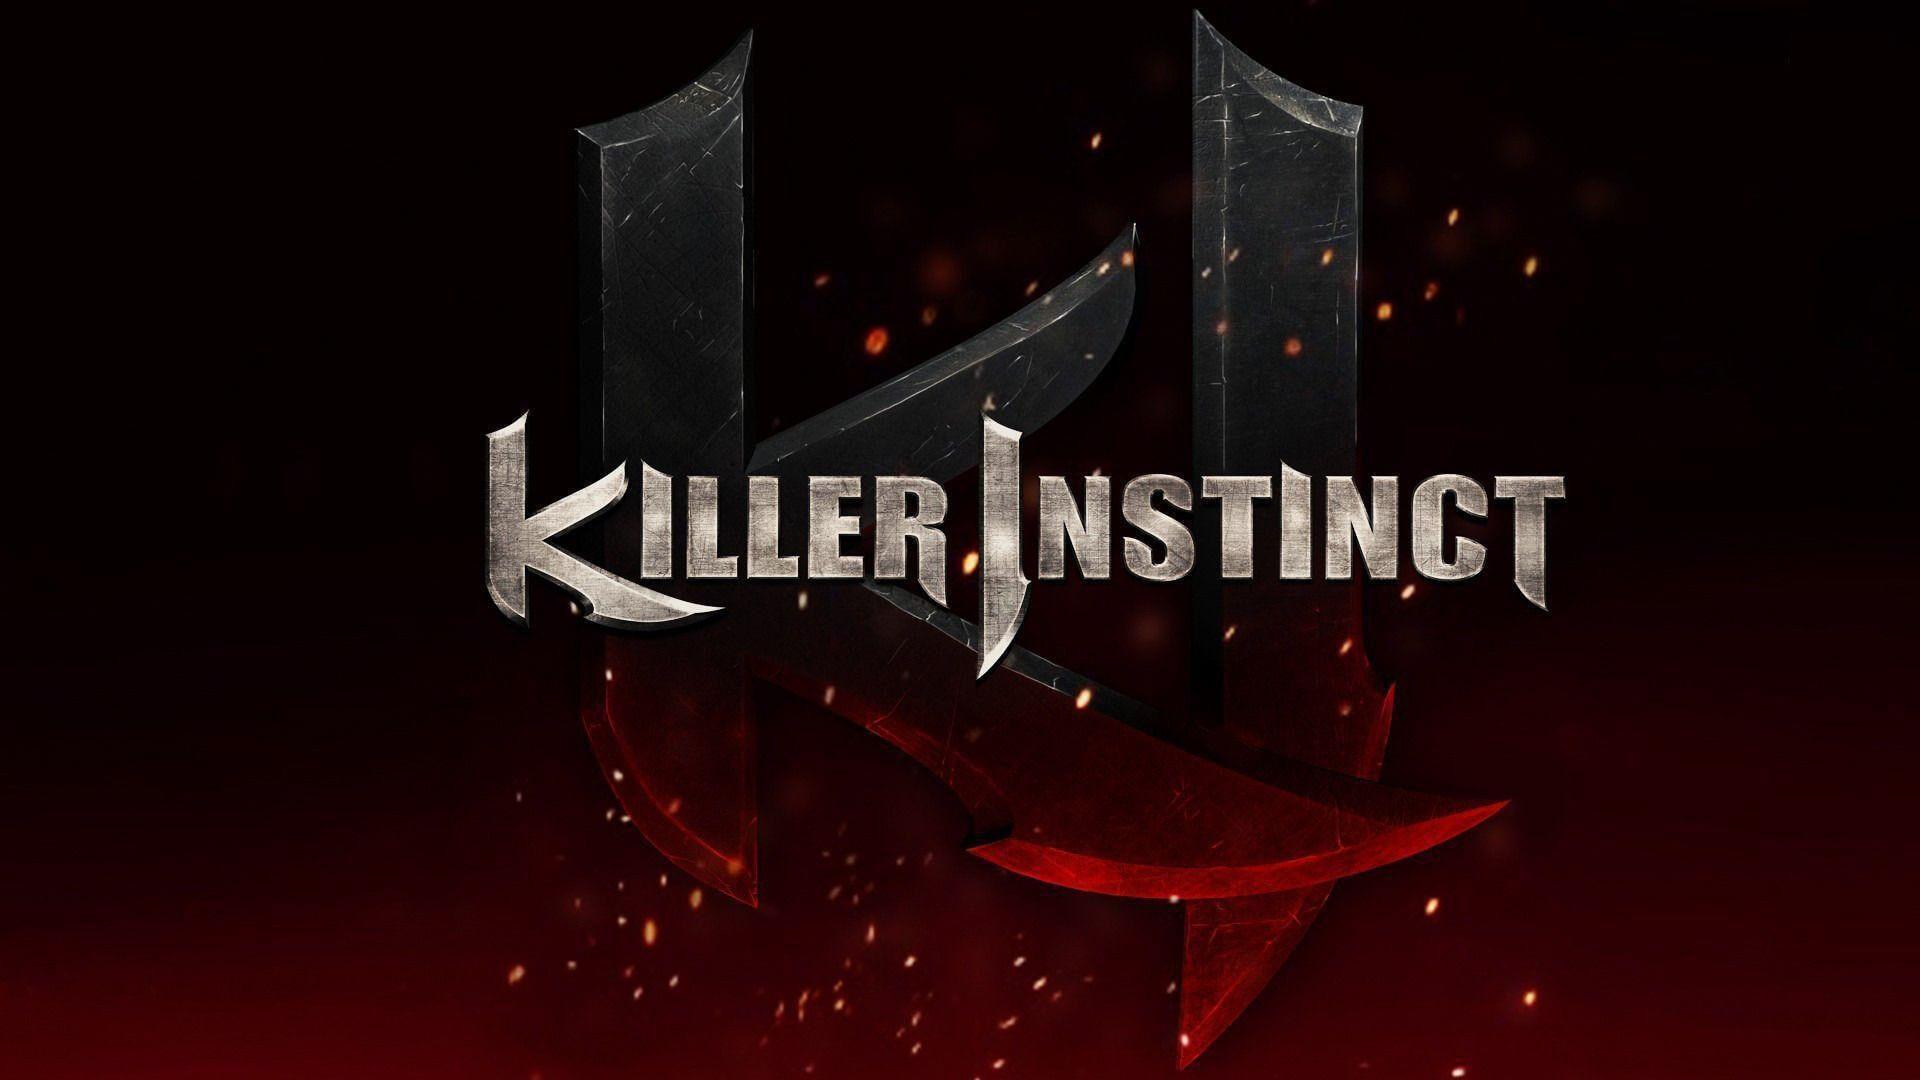 Killer instinct : Νέο Update το κάνει 100% συμβατό με τα XBOX Series X S